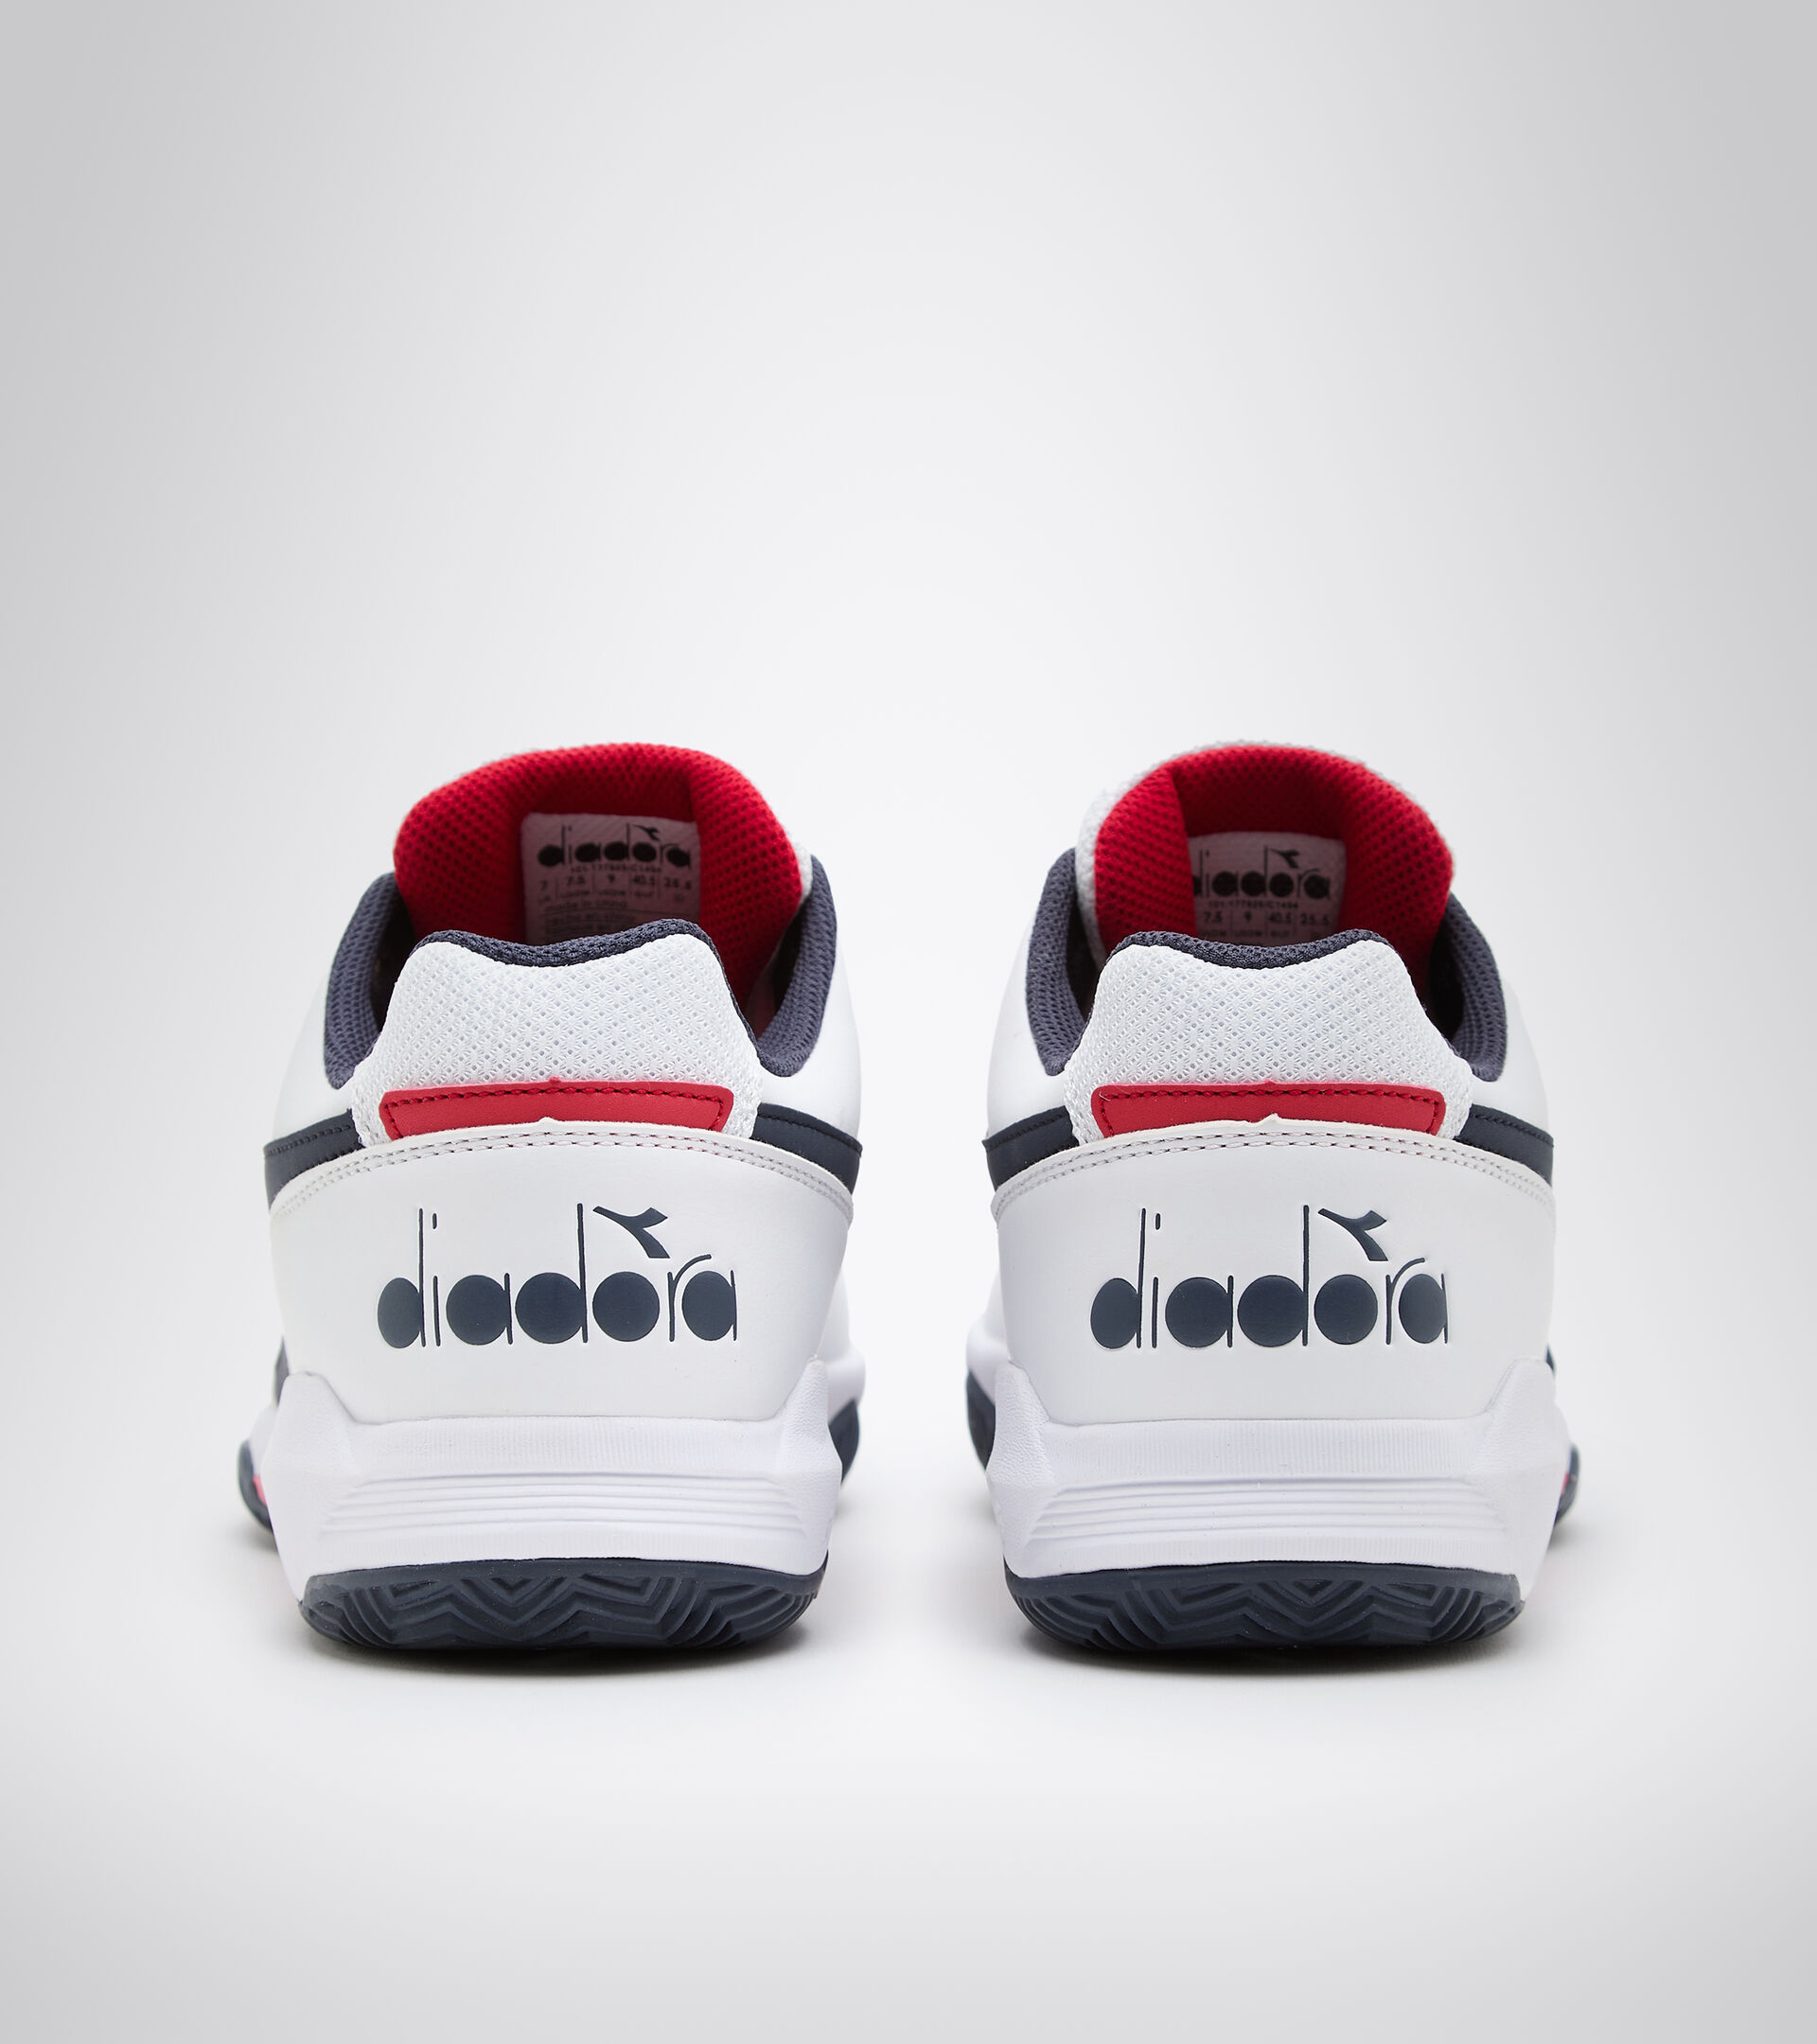 Footwear Sport UOMO S.CHALLENGE 3 SL CLAY WHITE/BLUE CORSAIR Diadora